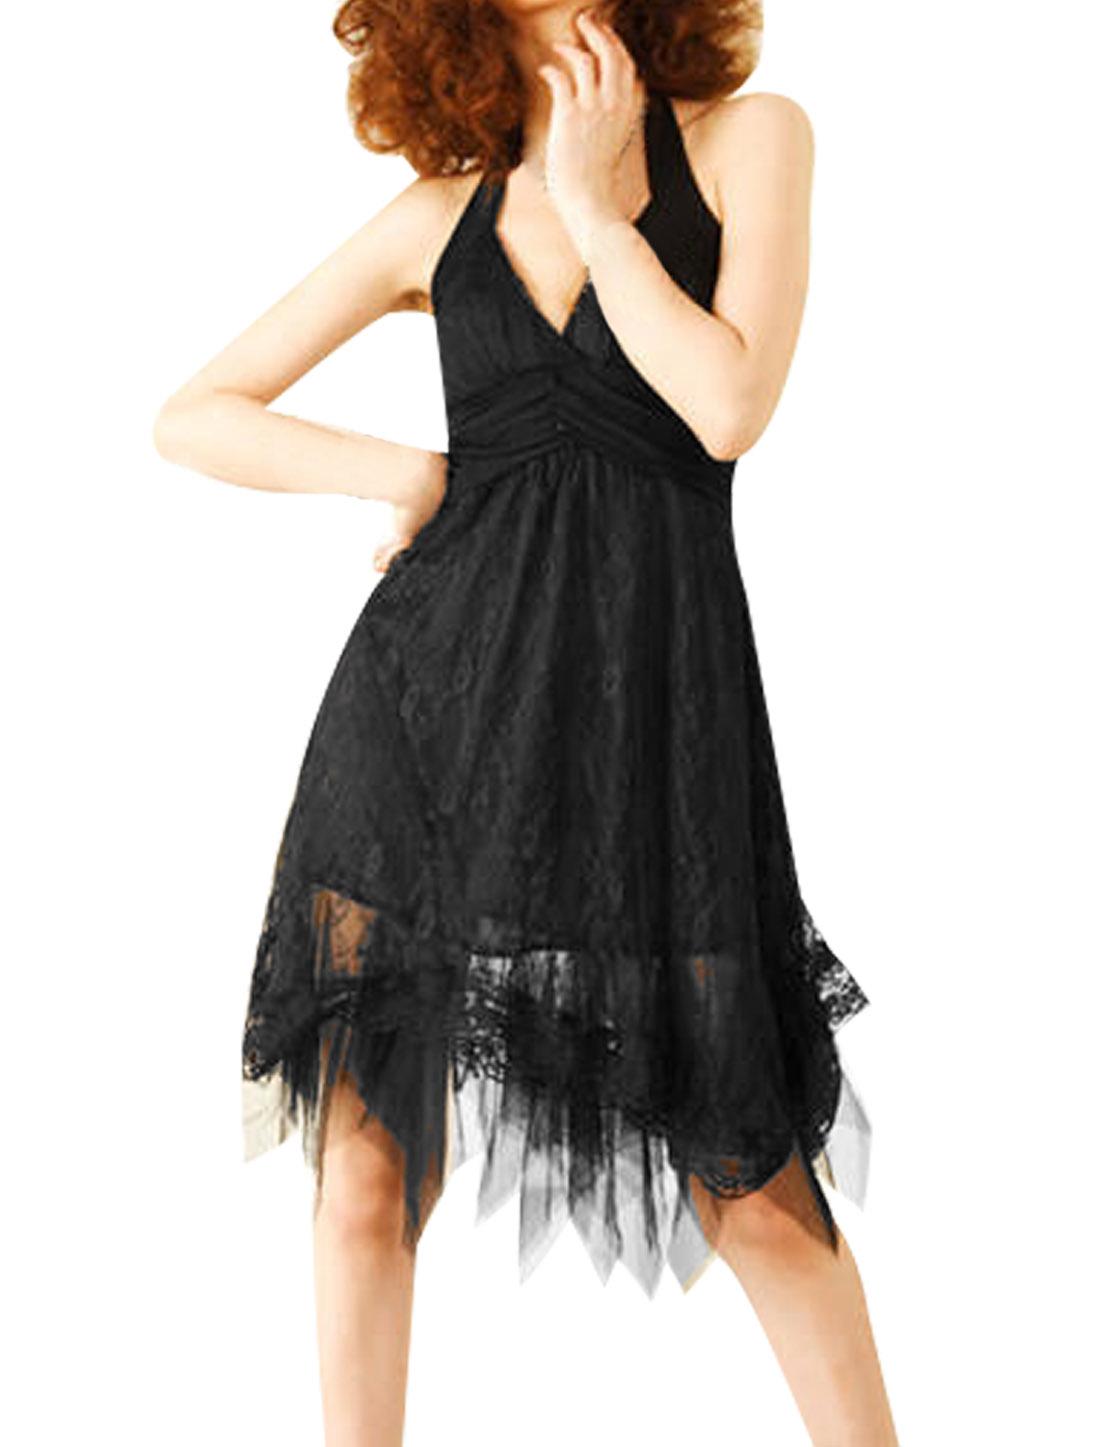 Women Self Tie Halter Neck Bare Back Sleeveless Black Scarf Hem Dress XS